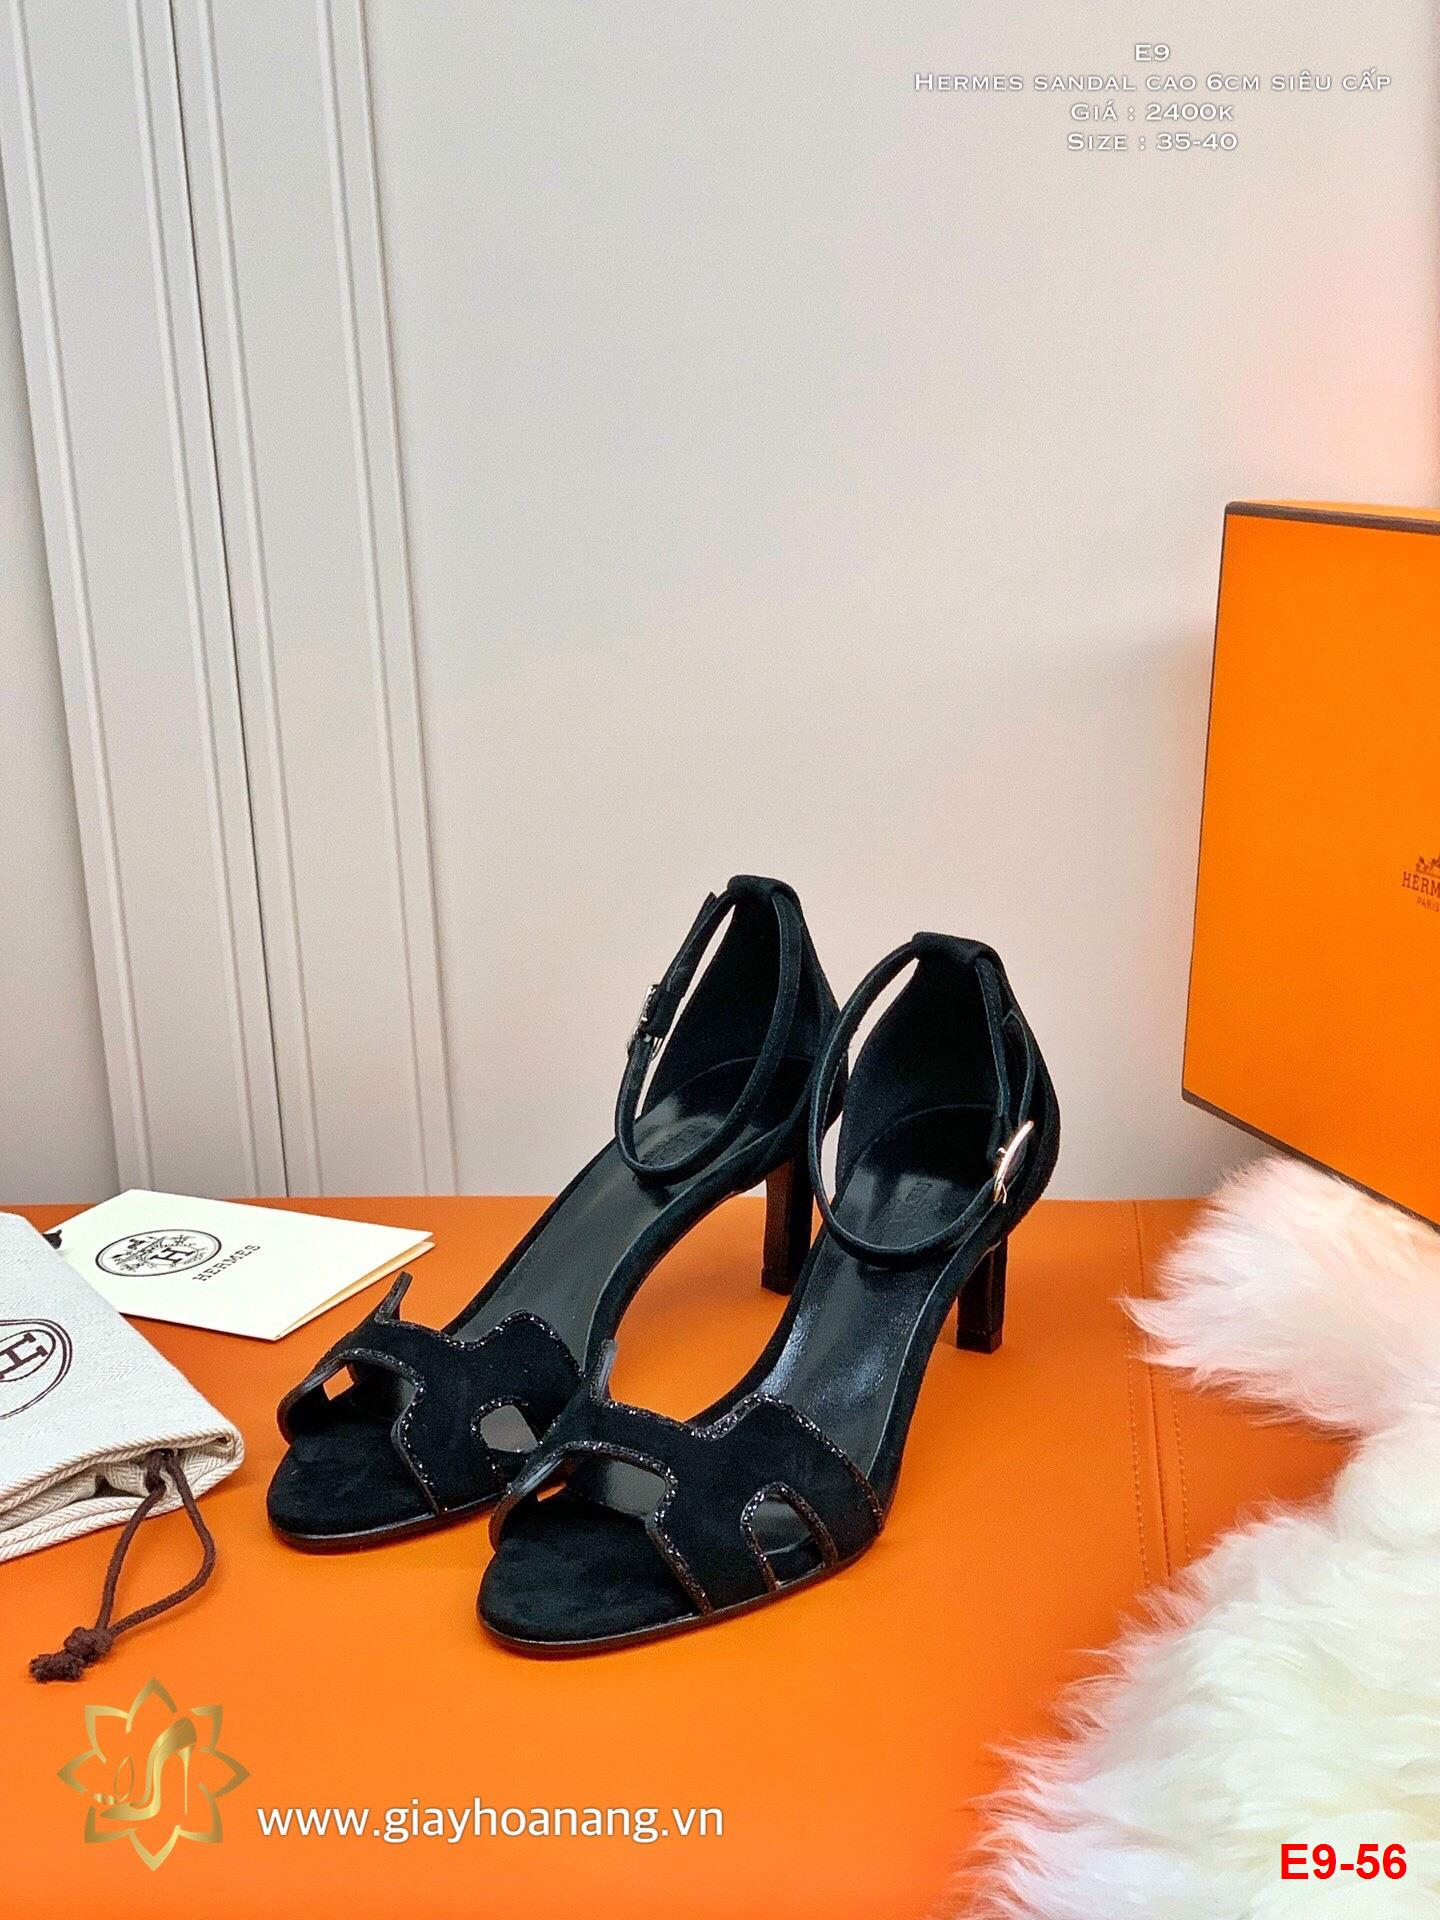 E9-56 Hermes sandal cao 6cm siêu cấp